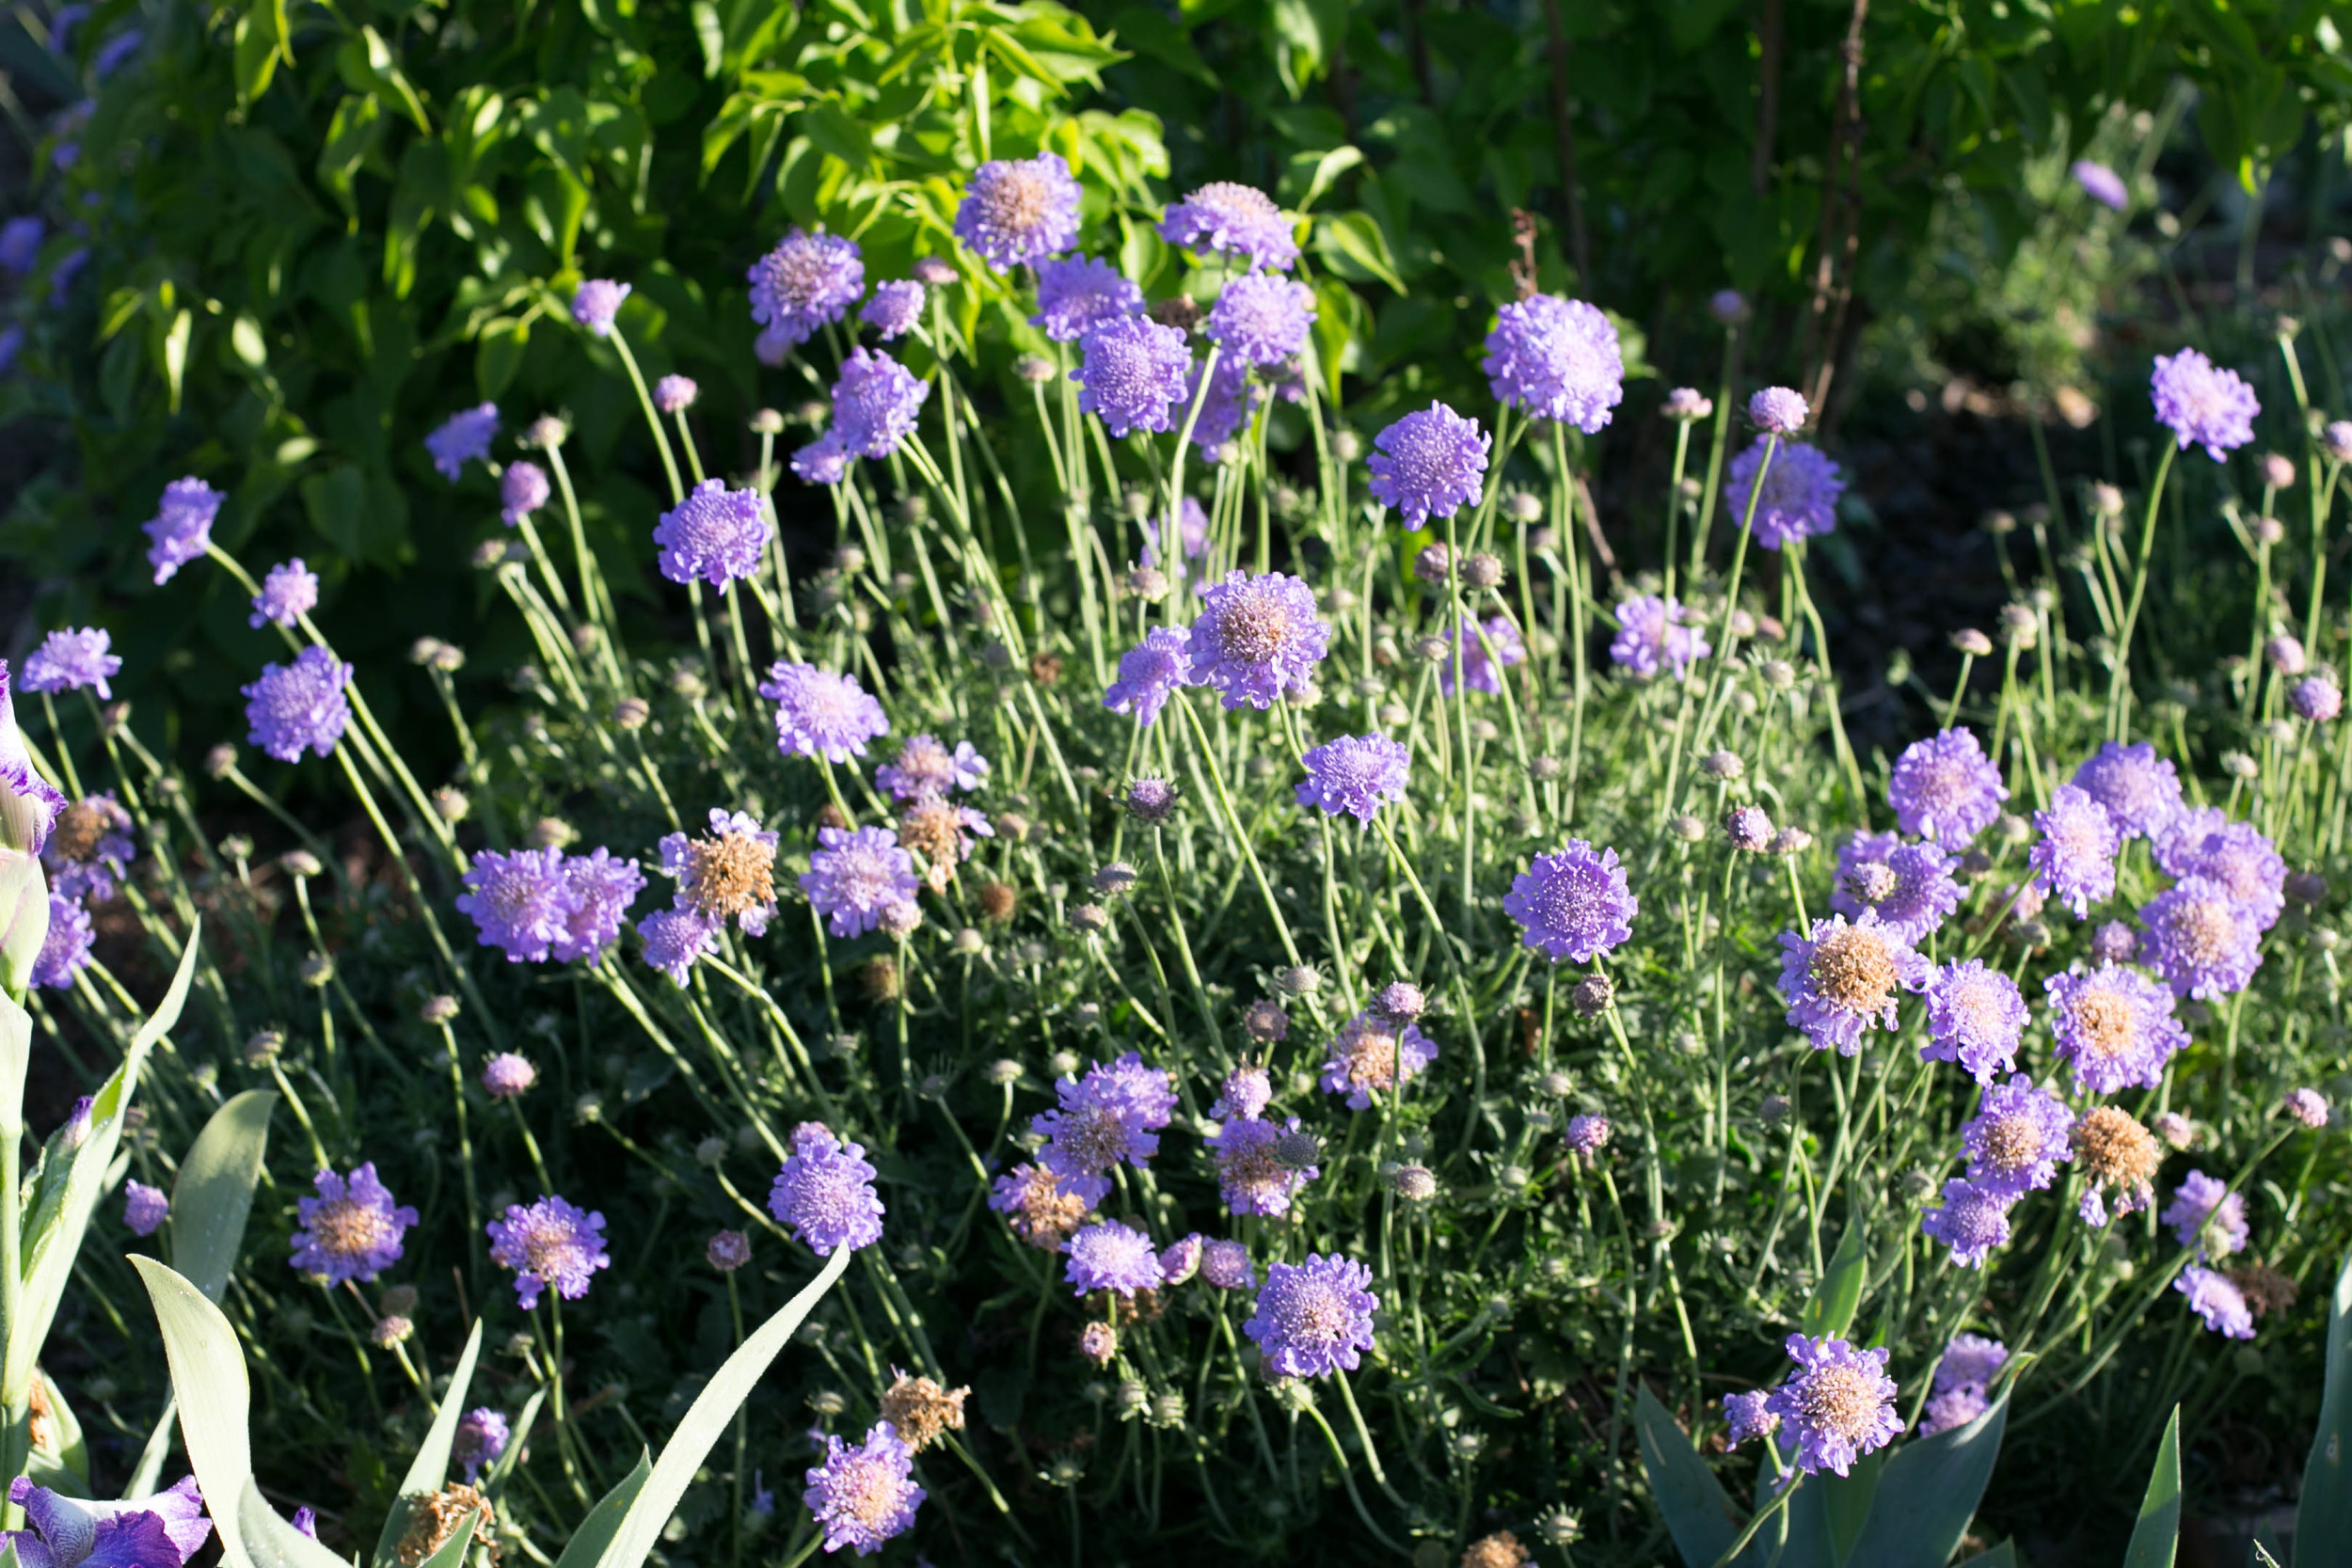 Scabiosa 'Butterfly Blue' (Pincushion Flower)